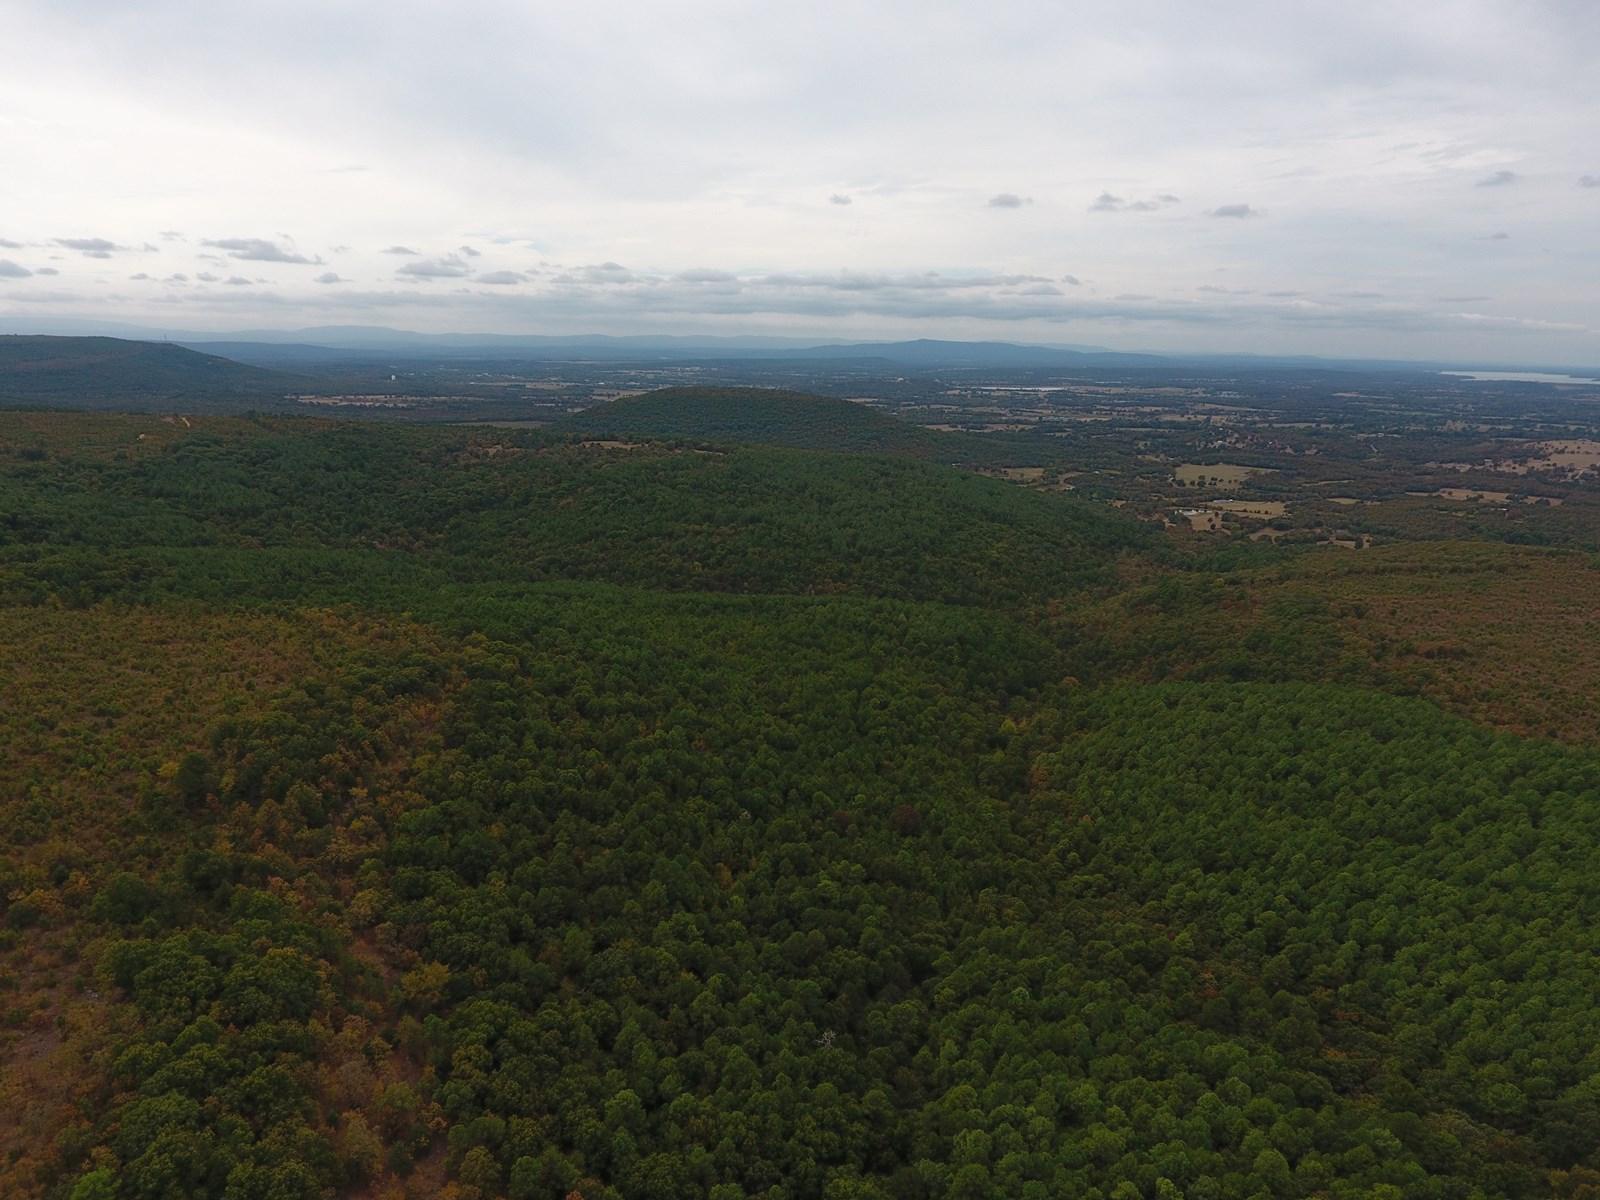 274 Acre Poteau Mountain Recreational Property